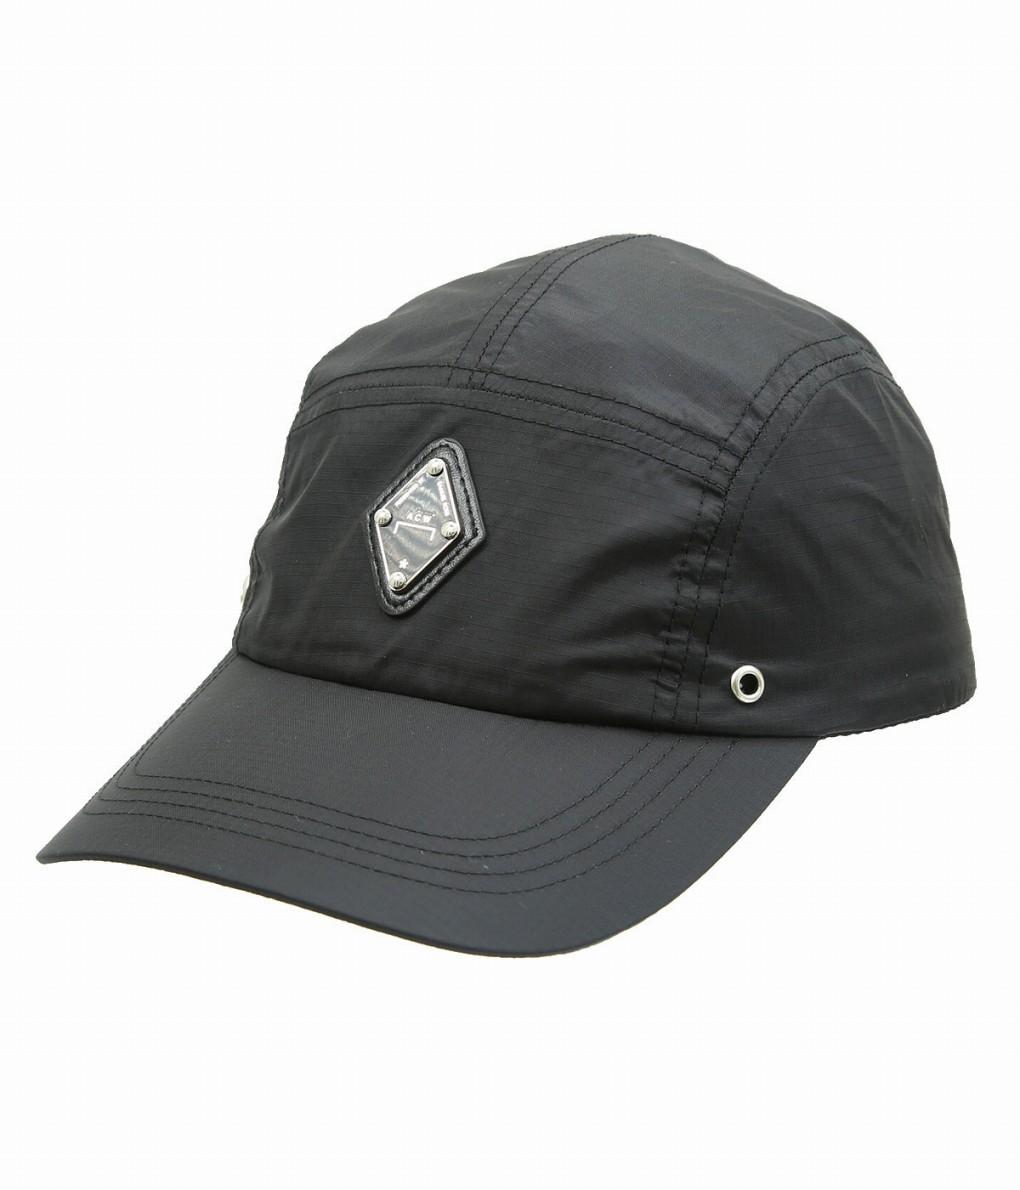 A-COLD-WALL* / ア コールド ウォール : RIPSTORM CAP : リップストーム キャップ 19AW 19秋冬 帽子 メンズ : ACW-MF19-ZCPC 【WAX】